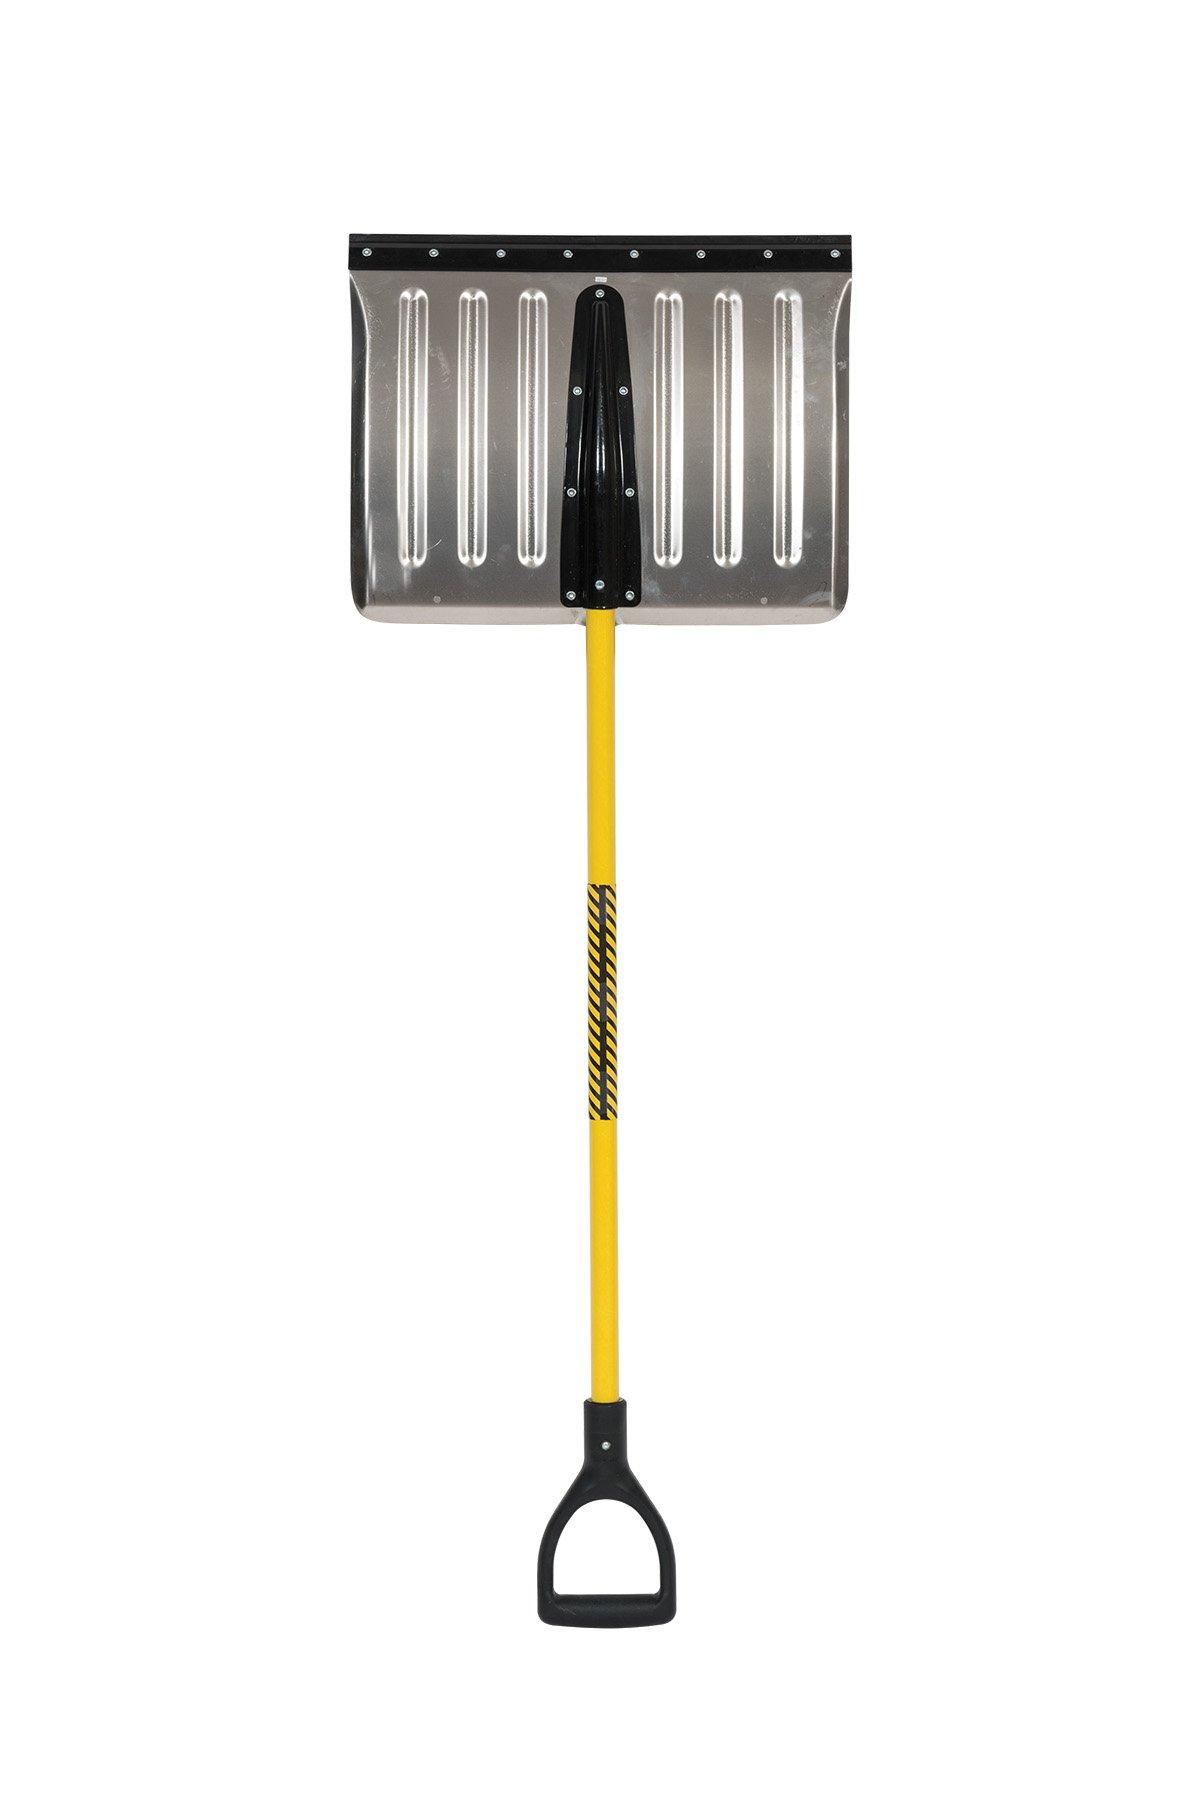 Structron STR-AS200 18'' Blade Snow Shovel, 41'' Fiberglass Handle, Poly D-Grip